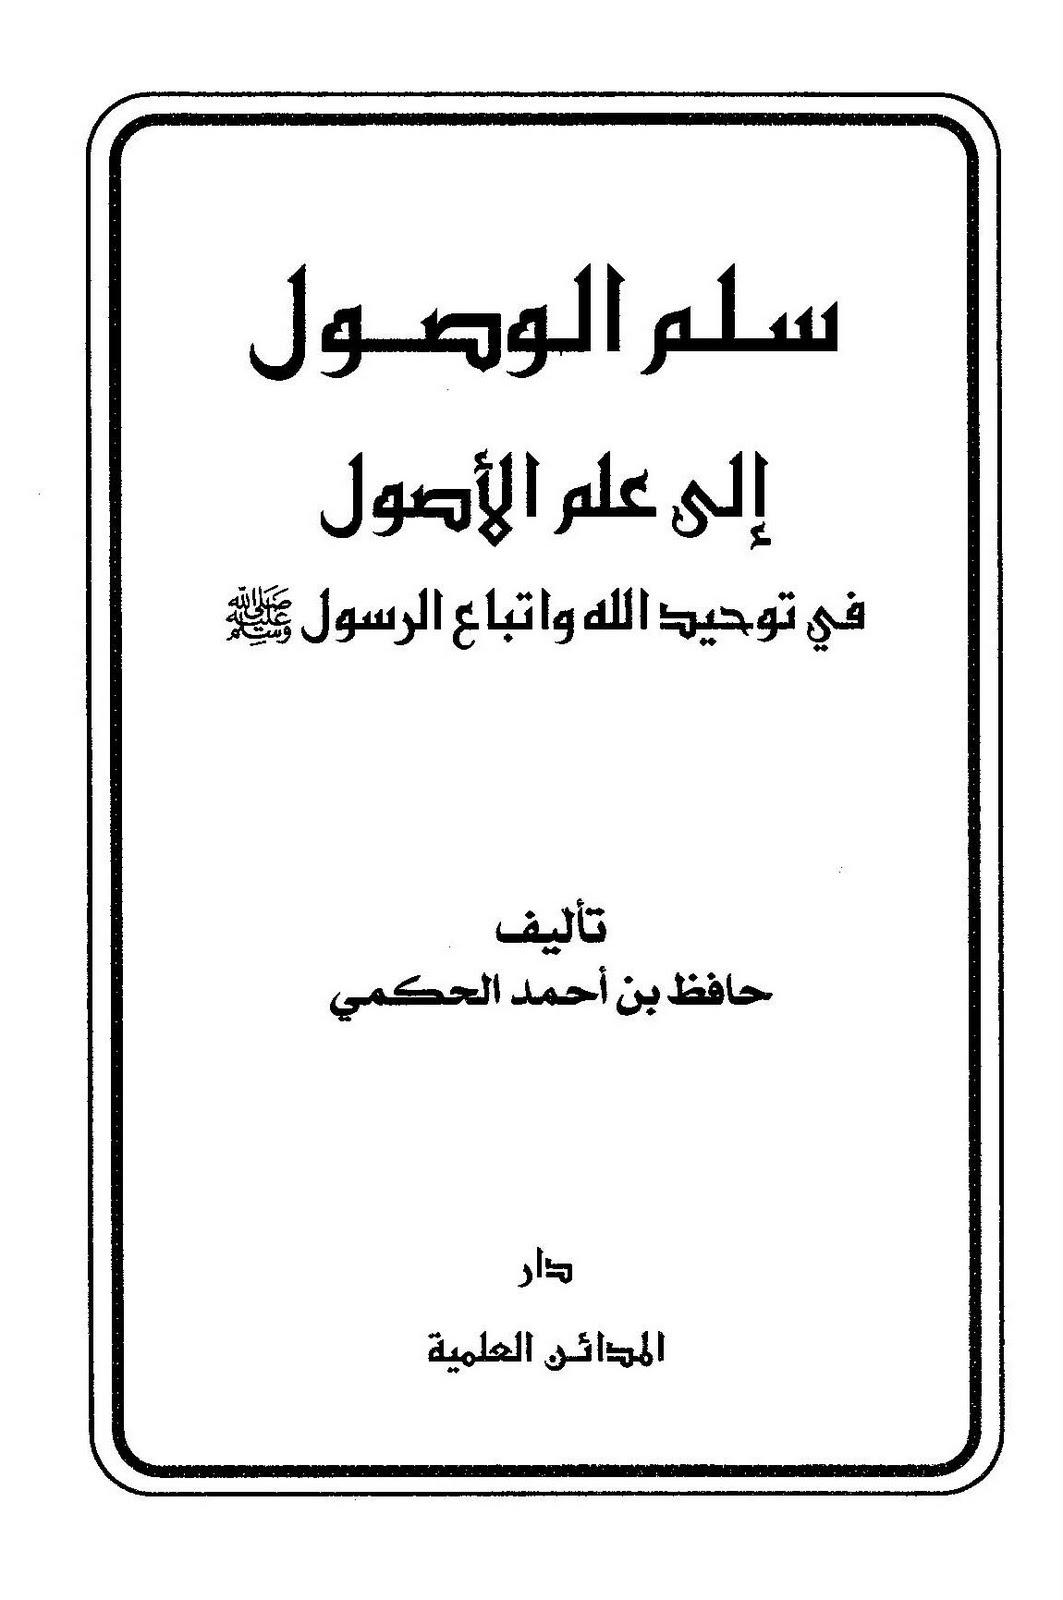 Photo of منظومة سلم الوصول إلى علم الأصول في توحيد الله واتباع الرسول صلى الله عليه وسلم